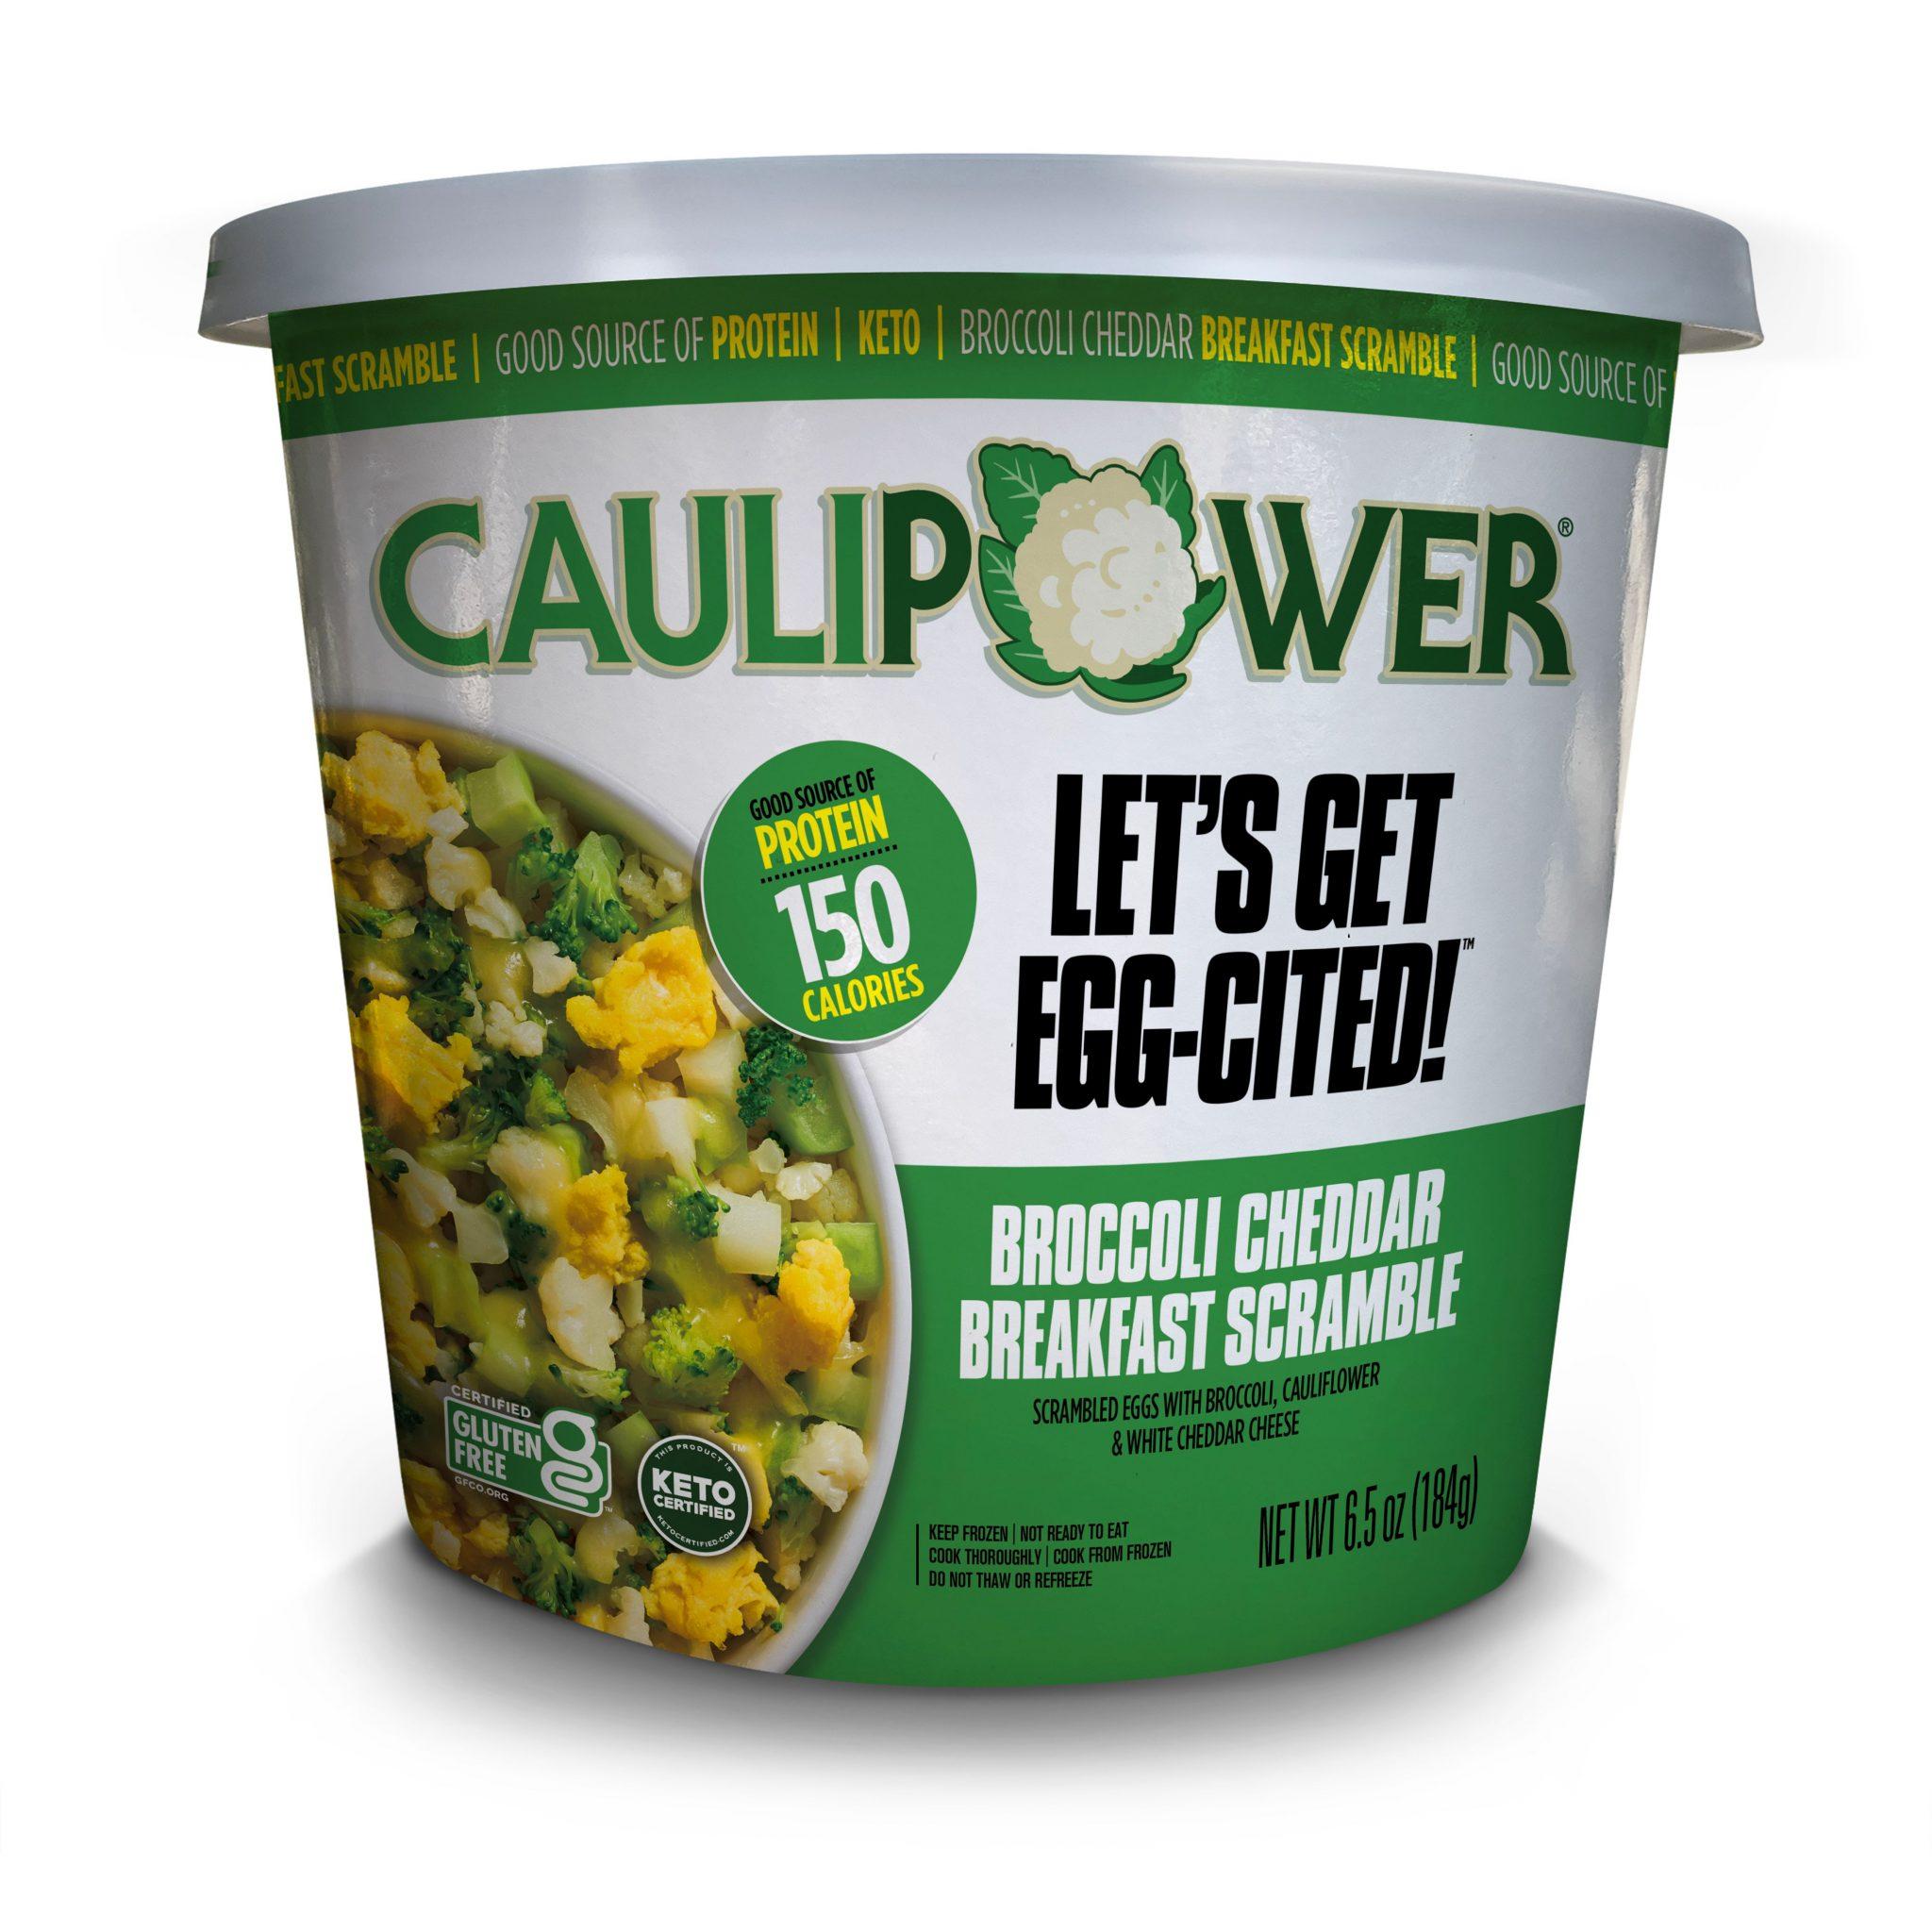 Broccoli Cheddar Breakfast Scramble - Caulipower - Keto Certified by the Paleo Foundation